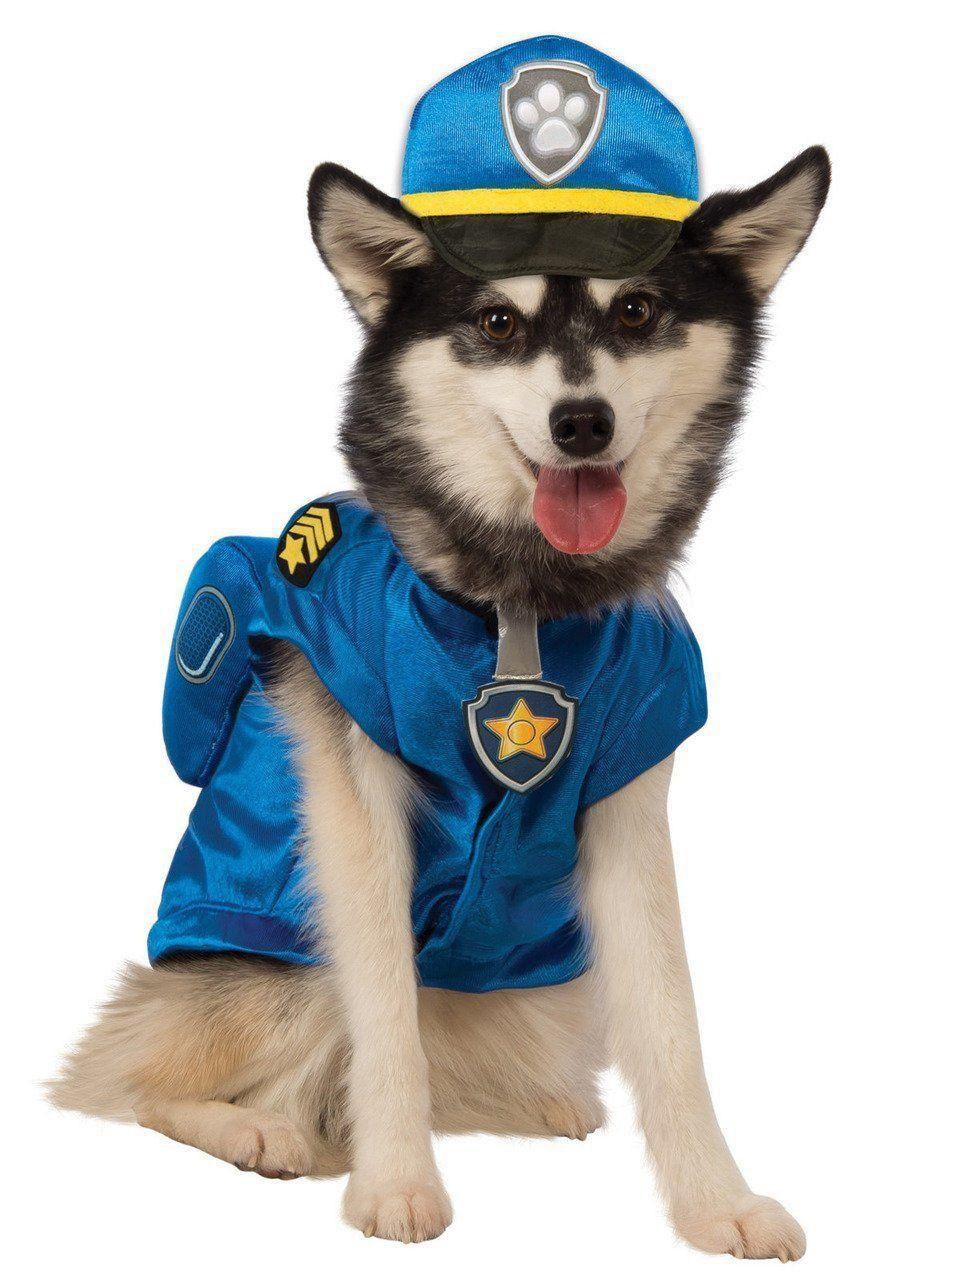 Fantasia Pet Chase: Patrulha Canina (Apenas Venda Online)